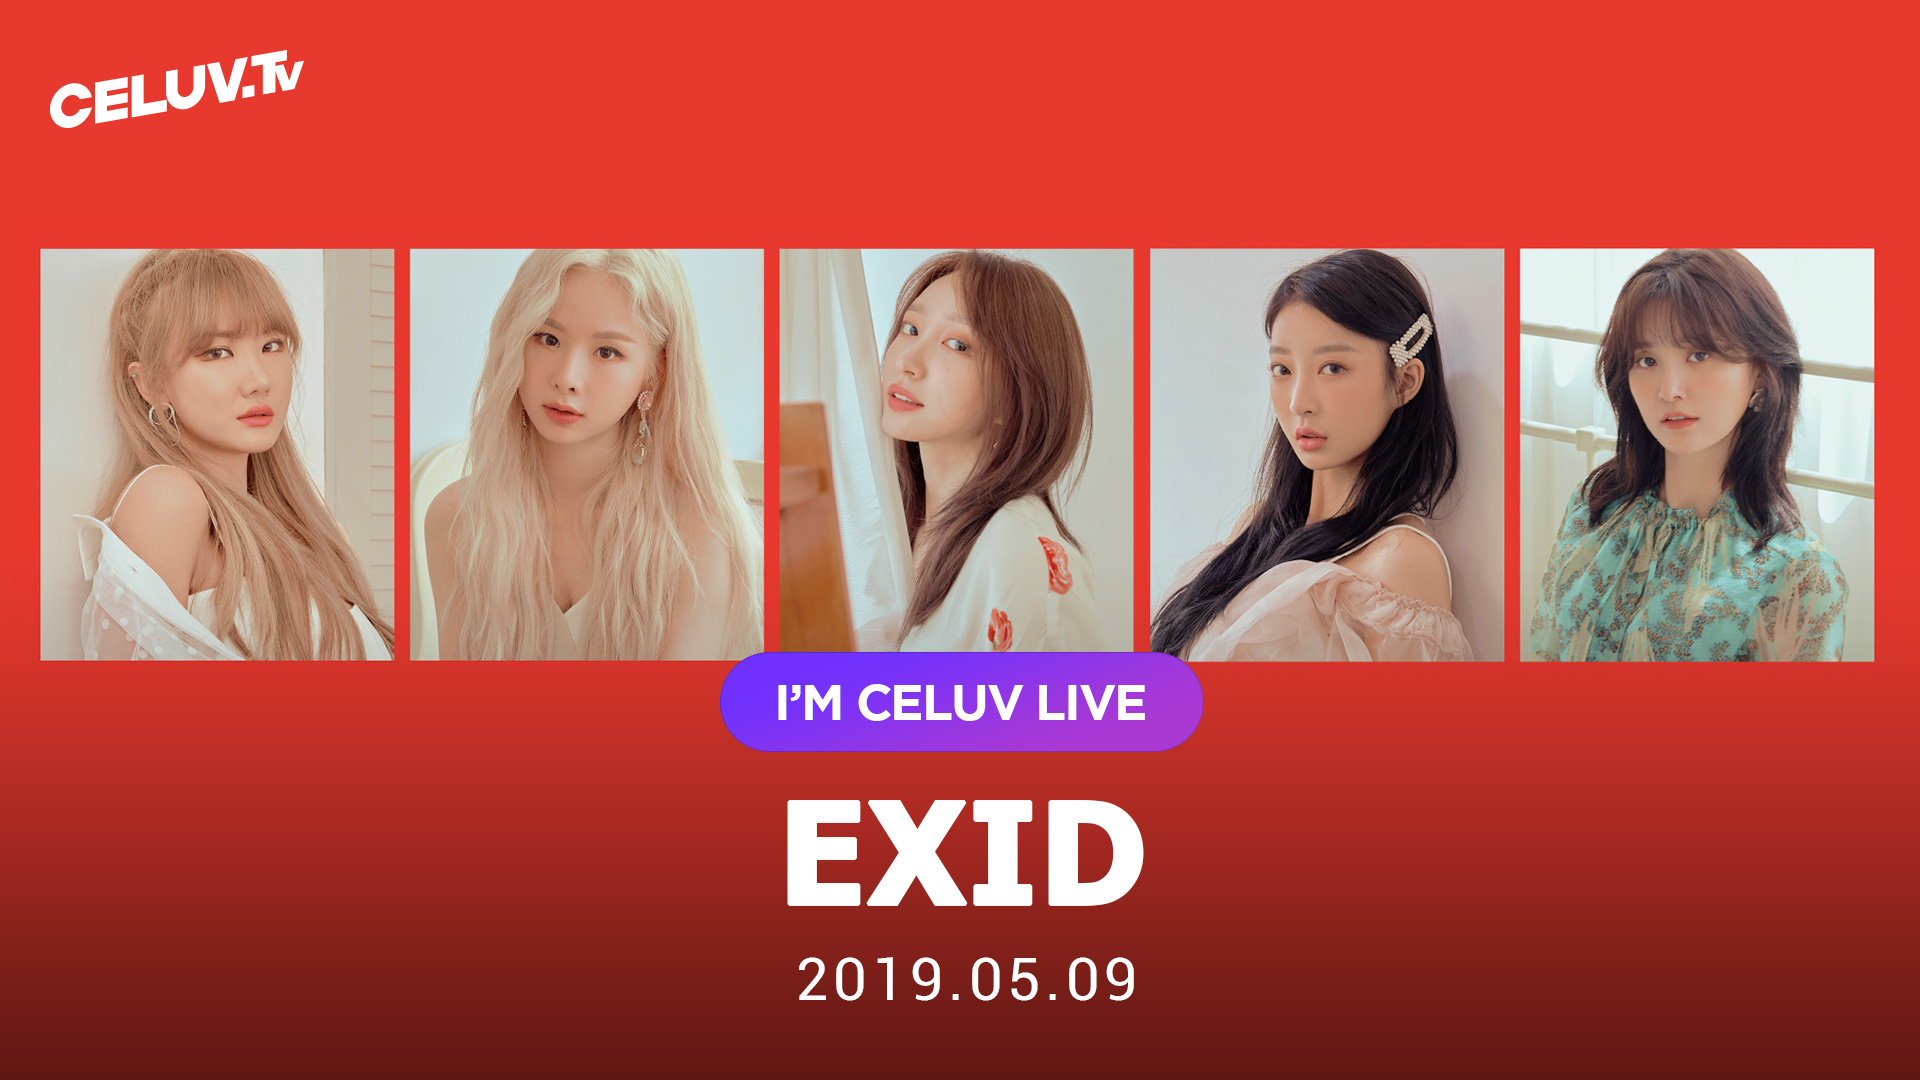 [I'm Celuv] EXID(이엑스아이디), 독보적인 매력의 소유자들! (Celuv.TV)